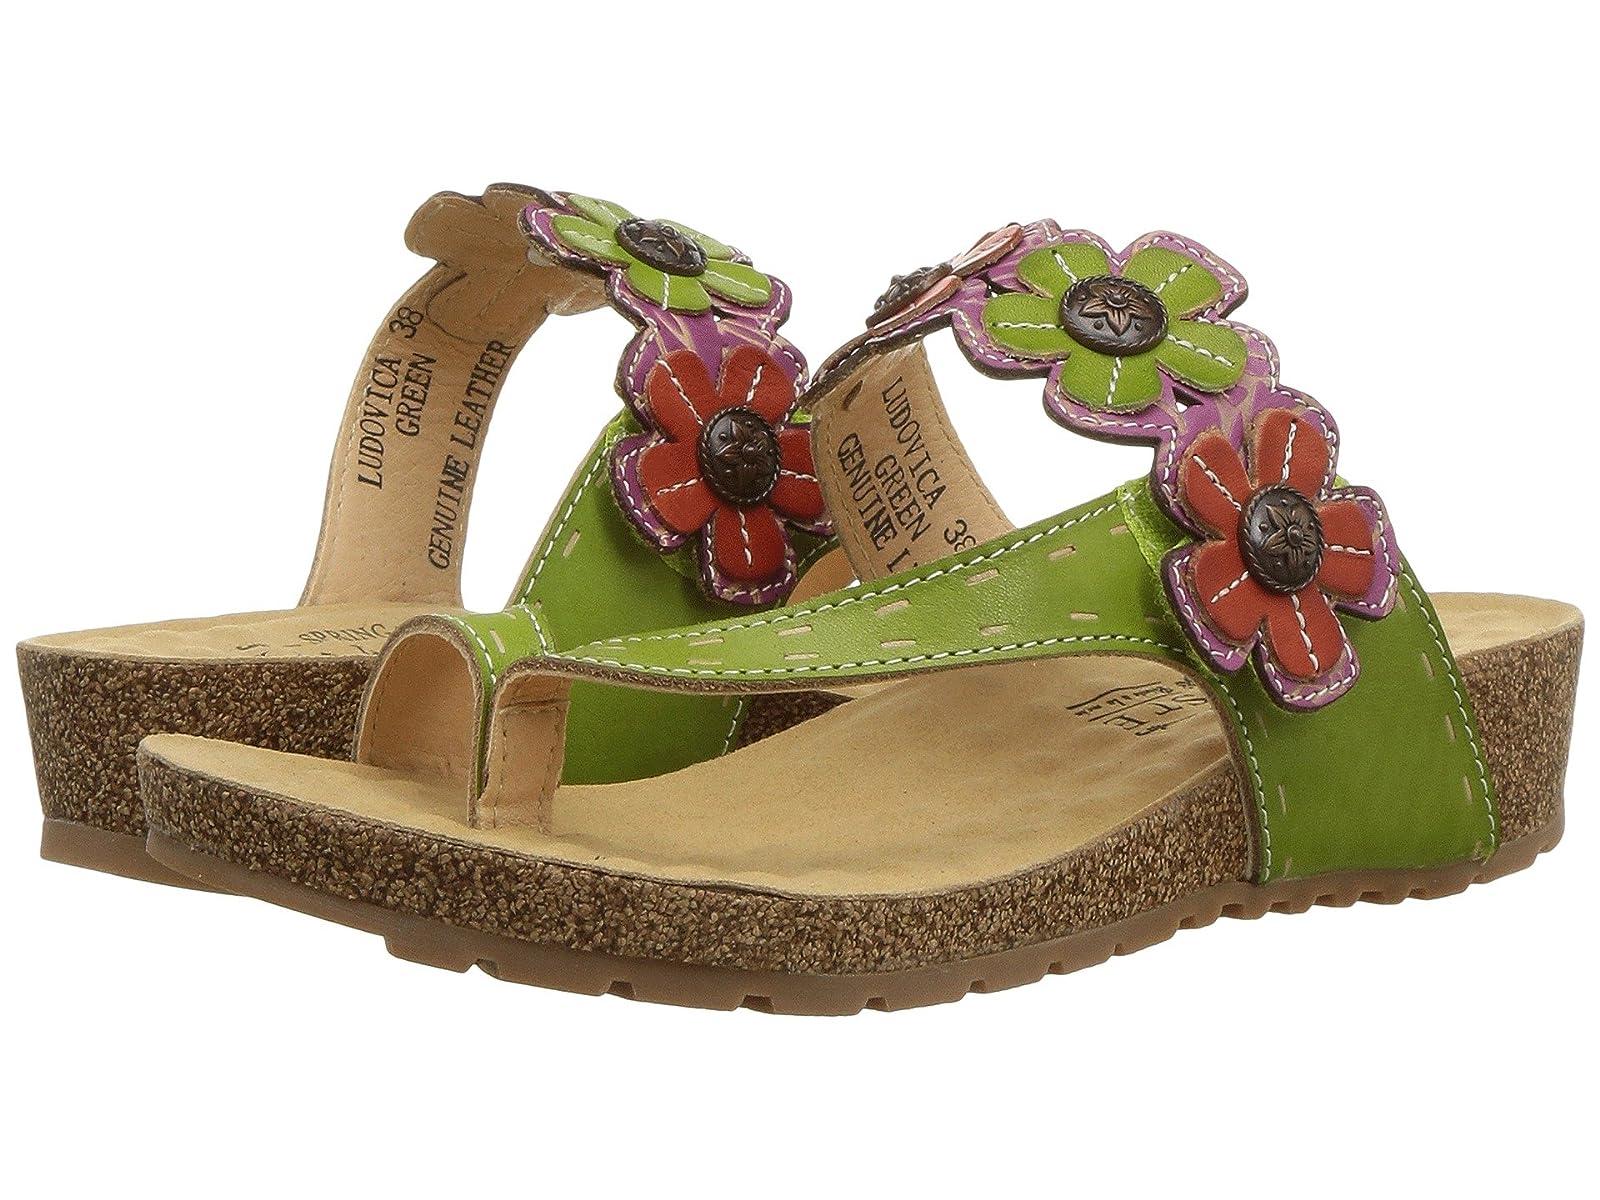 L'Artiste by Spring Step LudovicaAtmospheric grades have affordable shoes